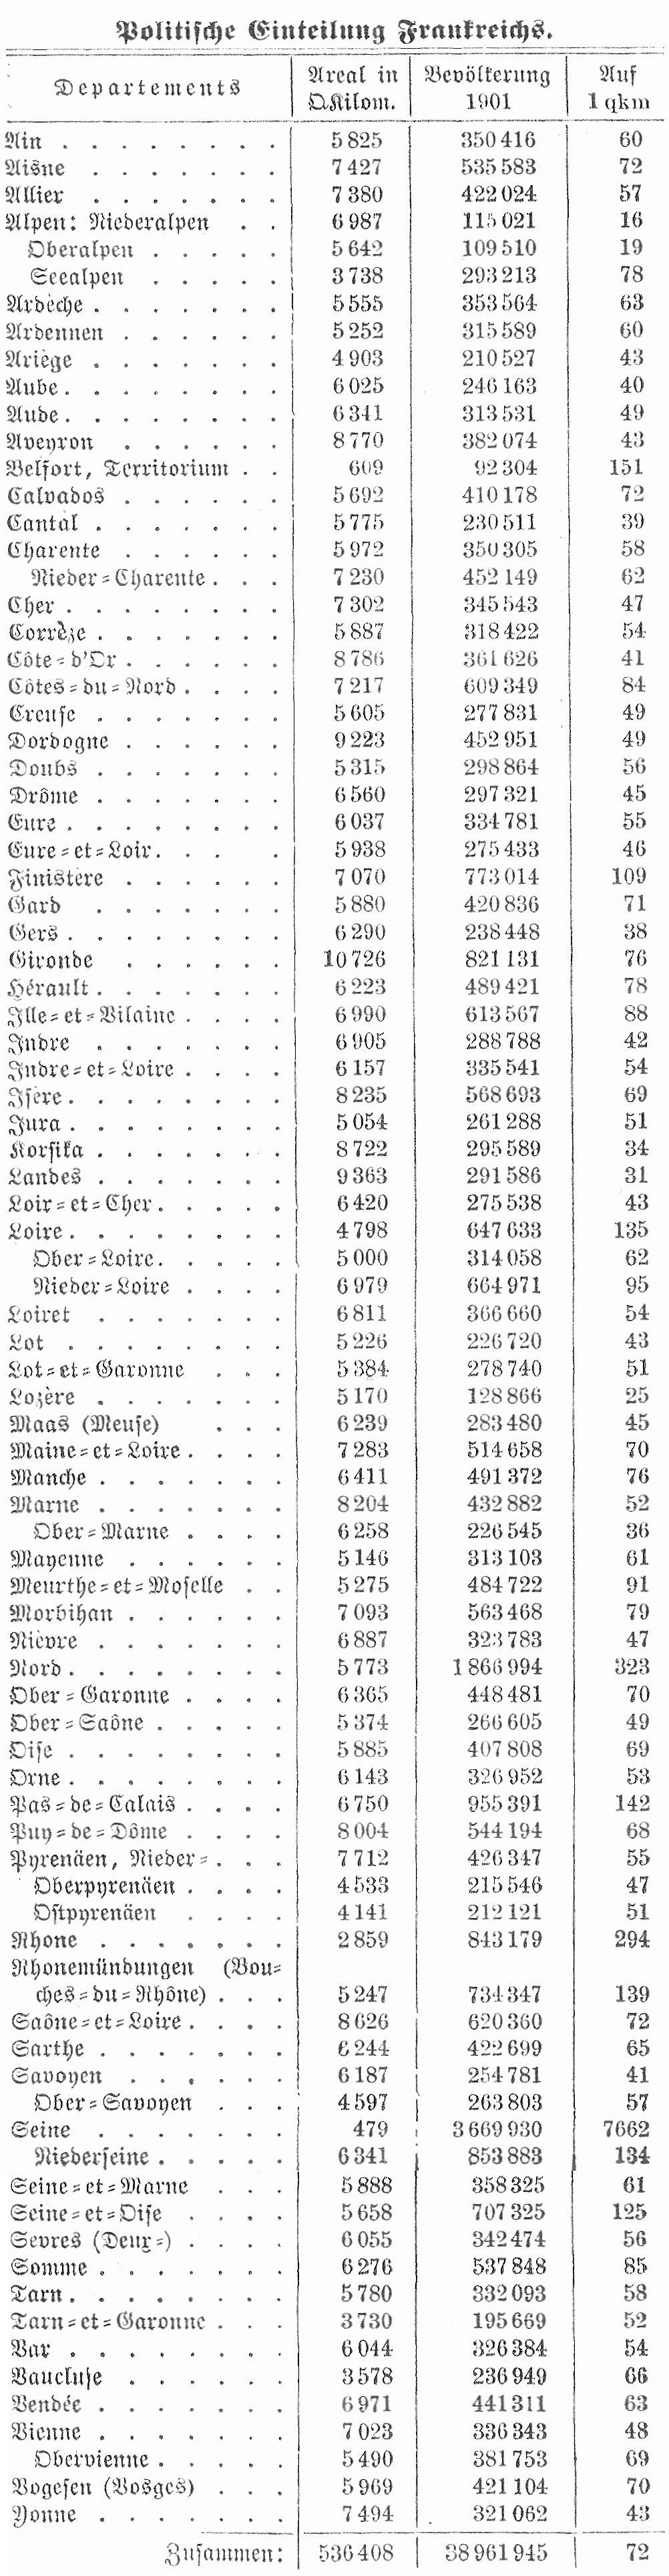 Tabelle Frankreich